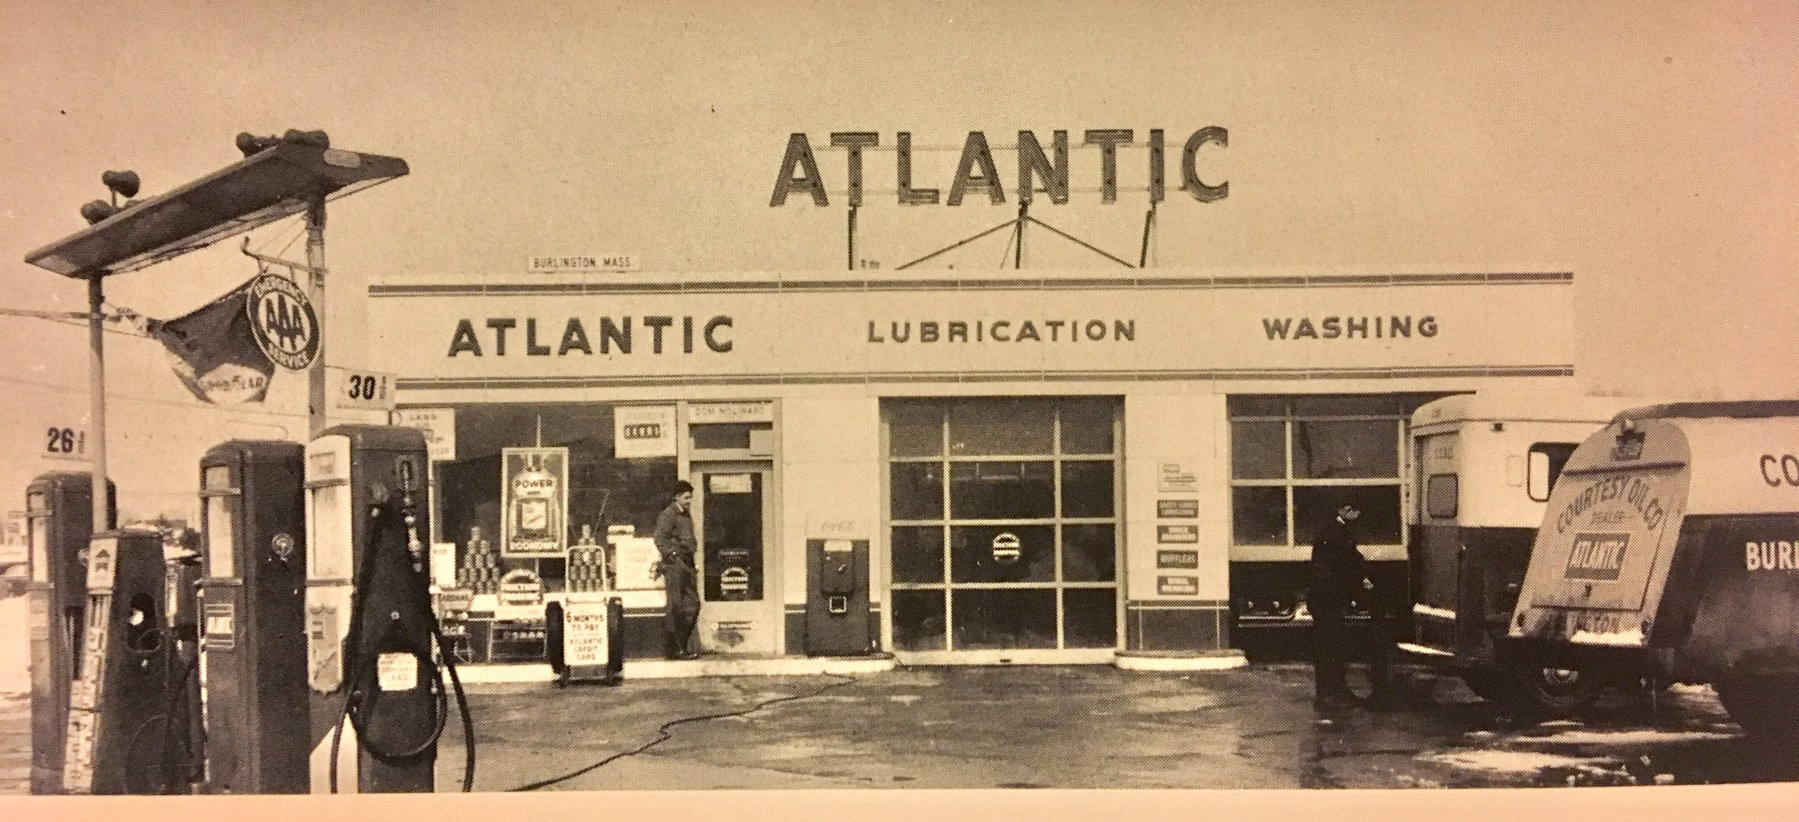 Atlantic gas station, Burlington, MA 1950s